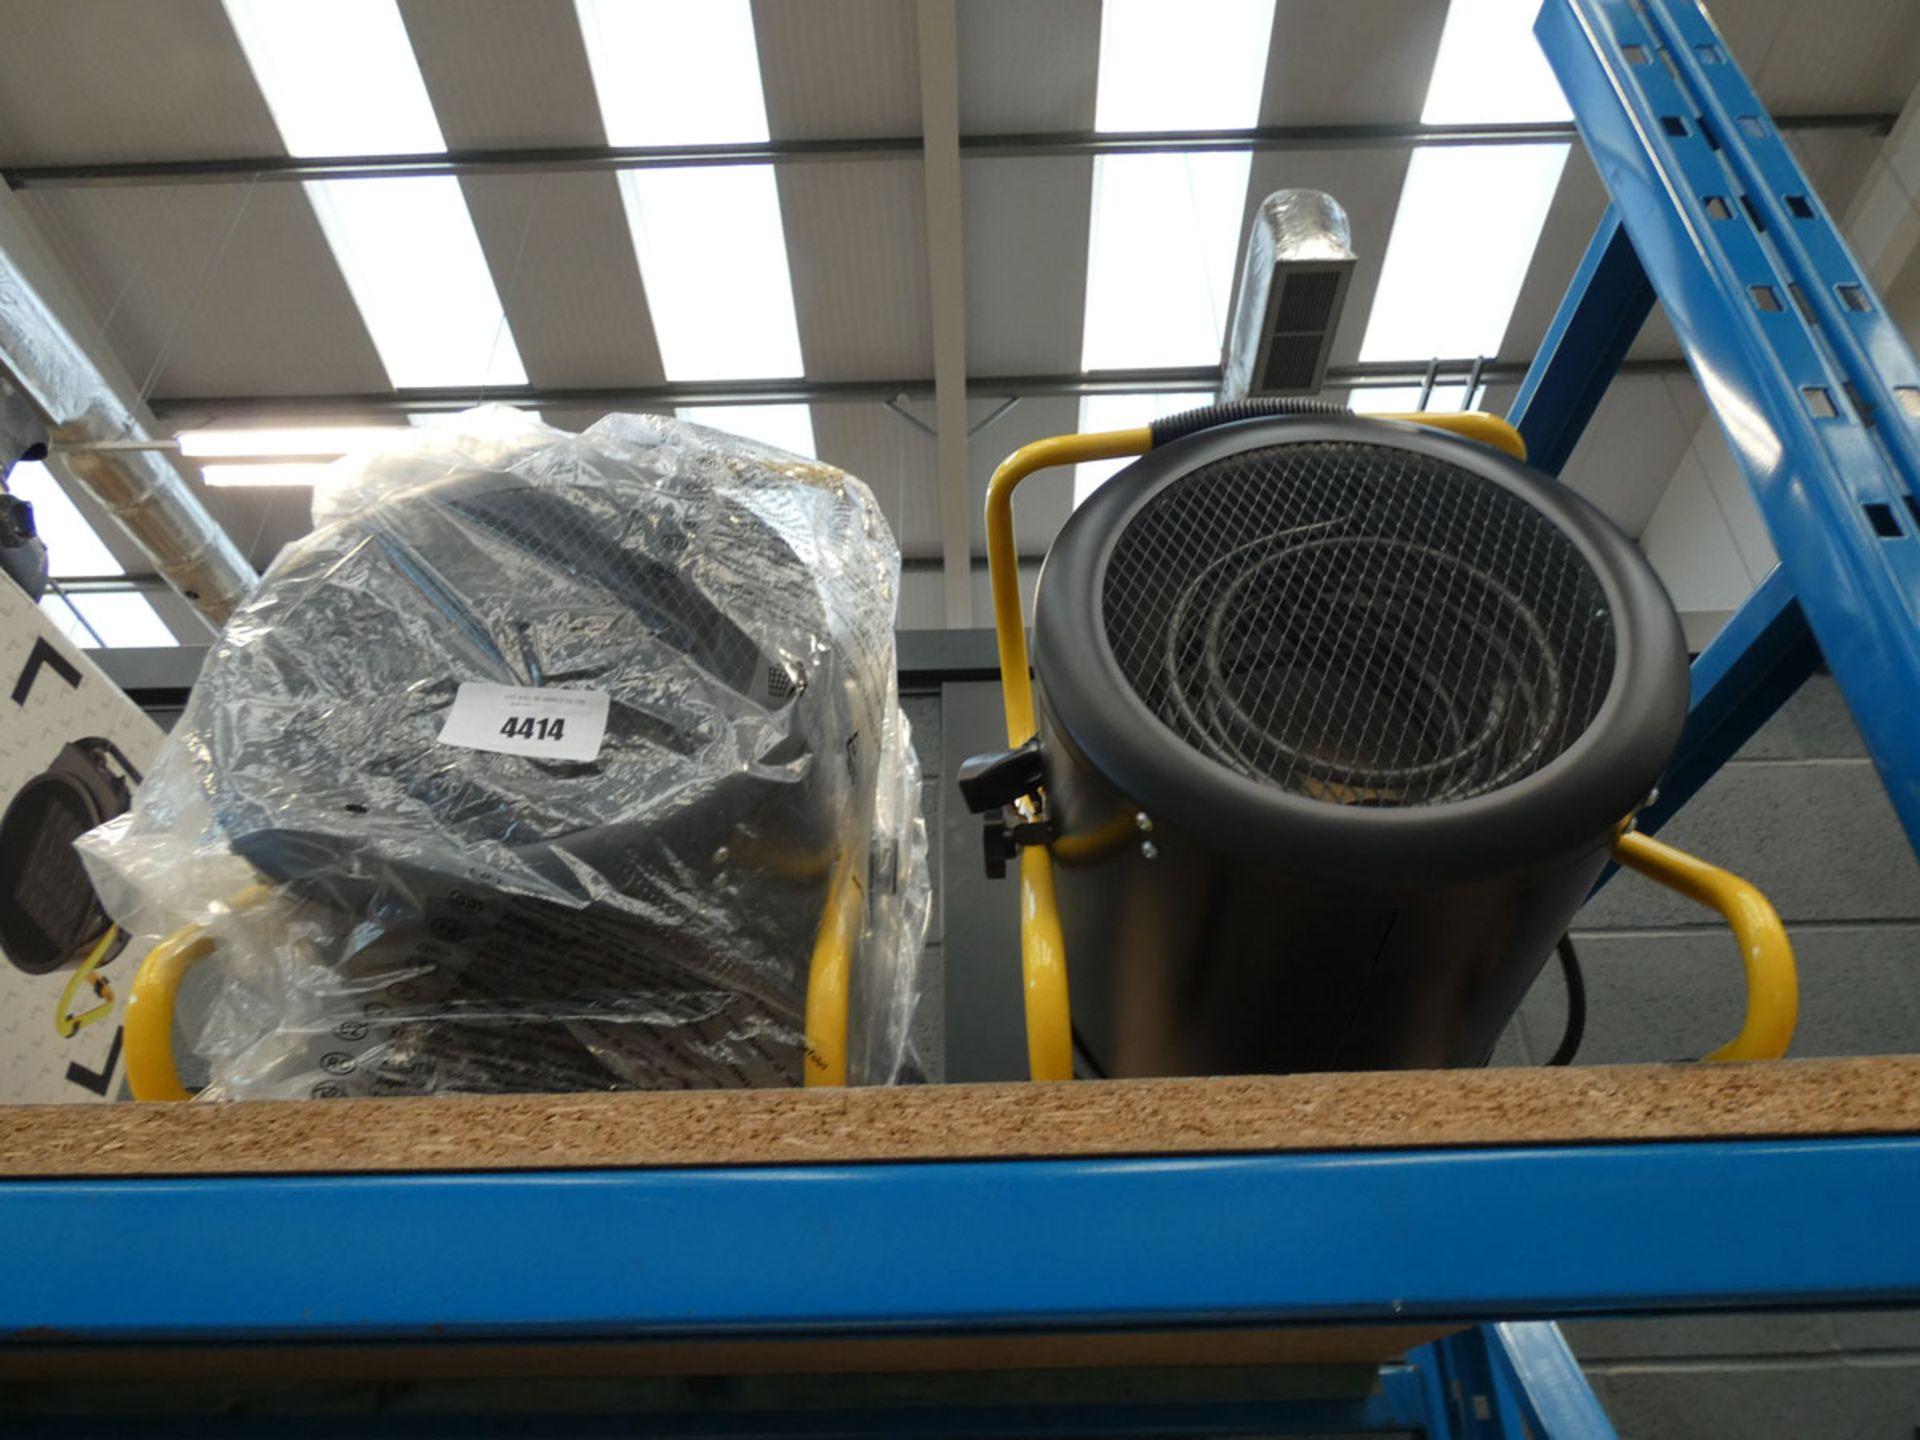 2 unboxed workshop heaters